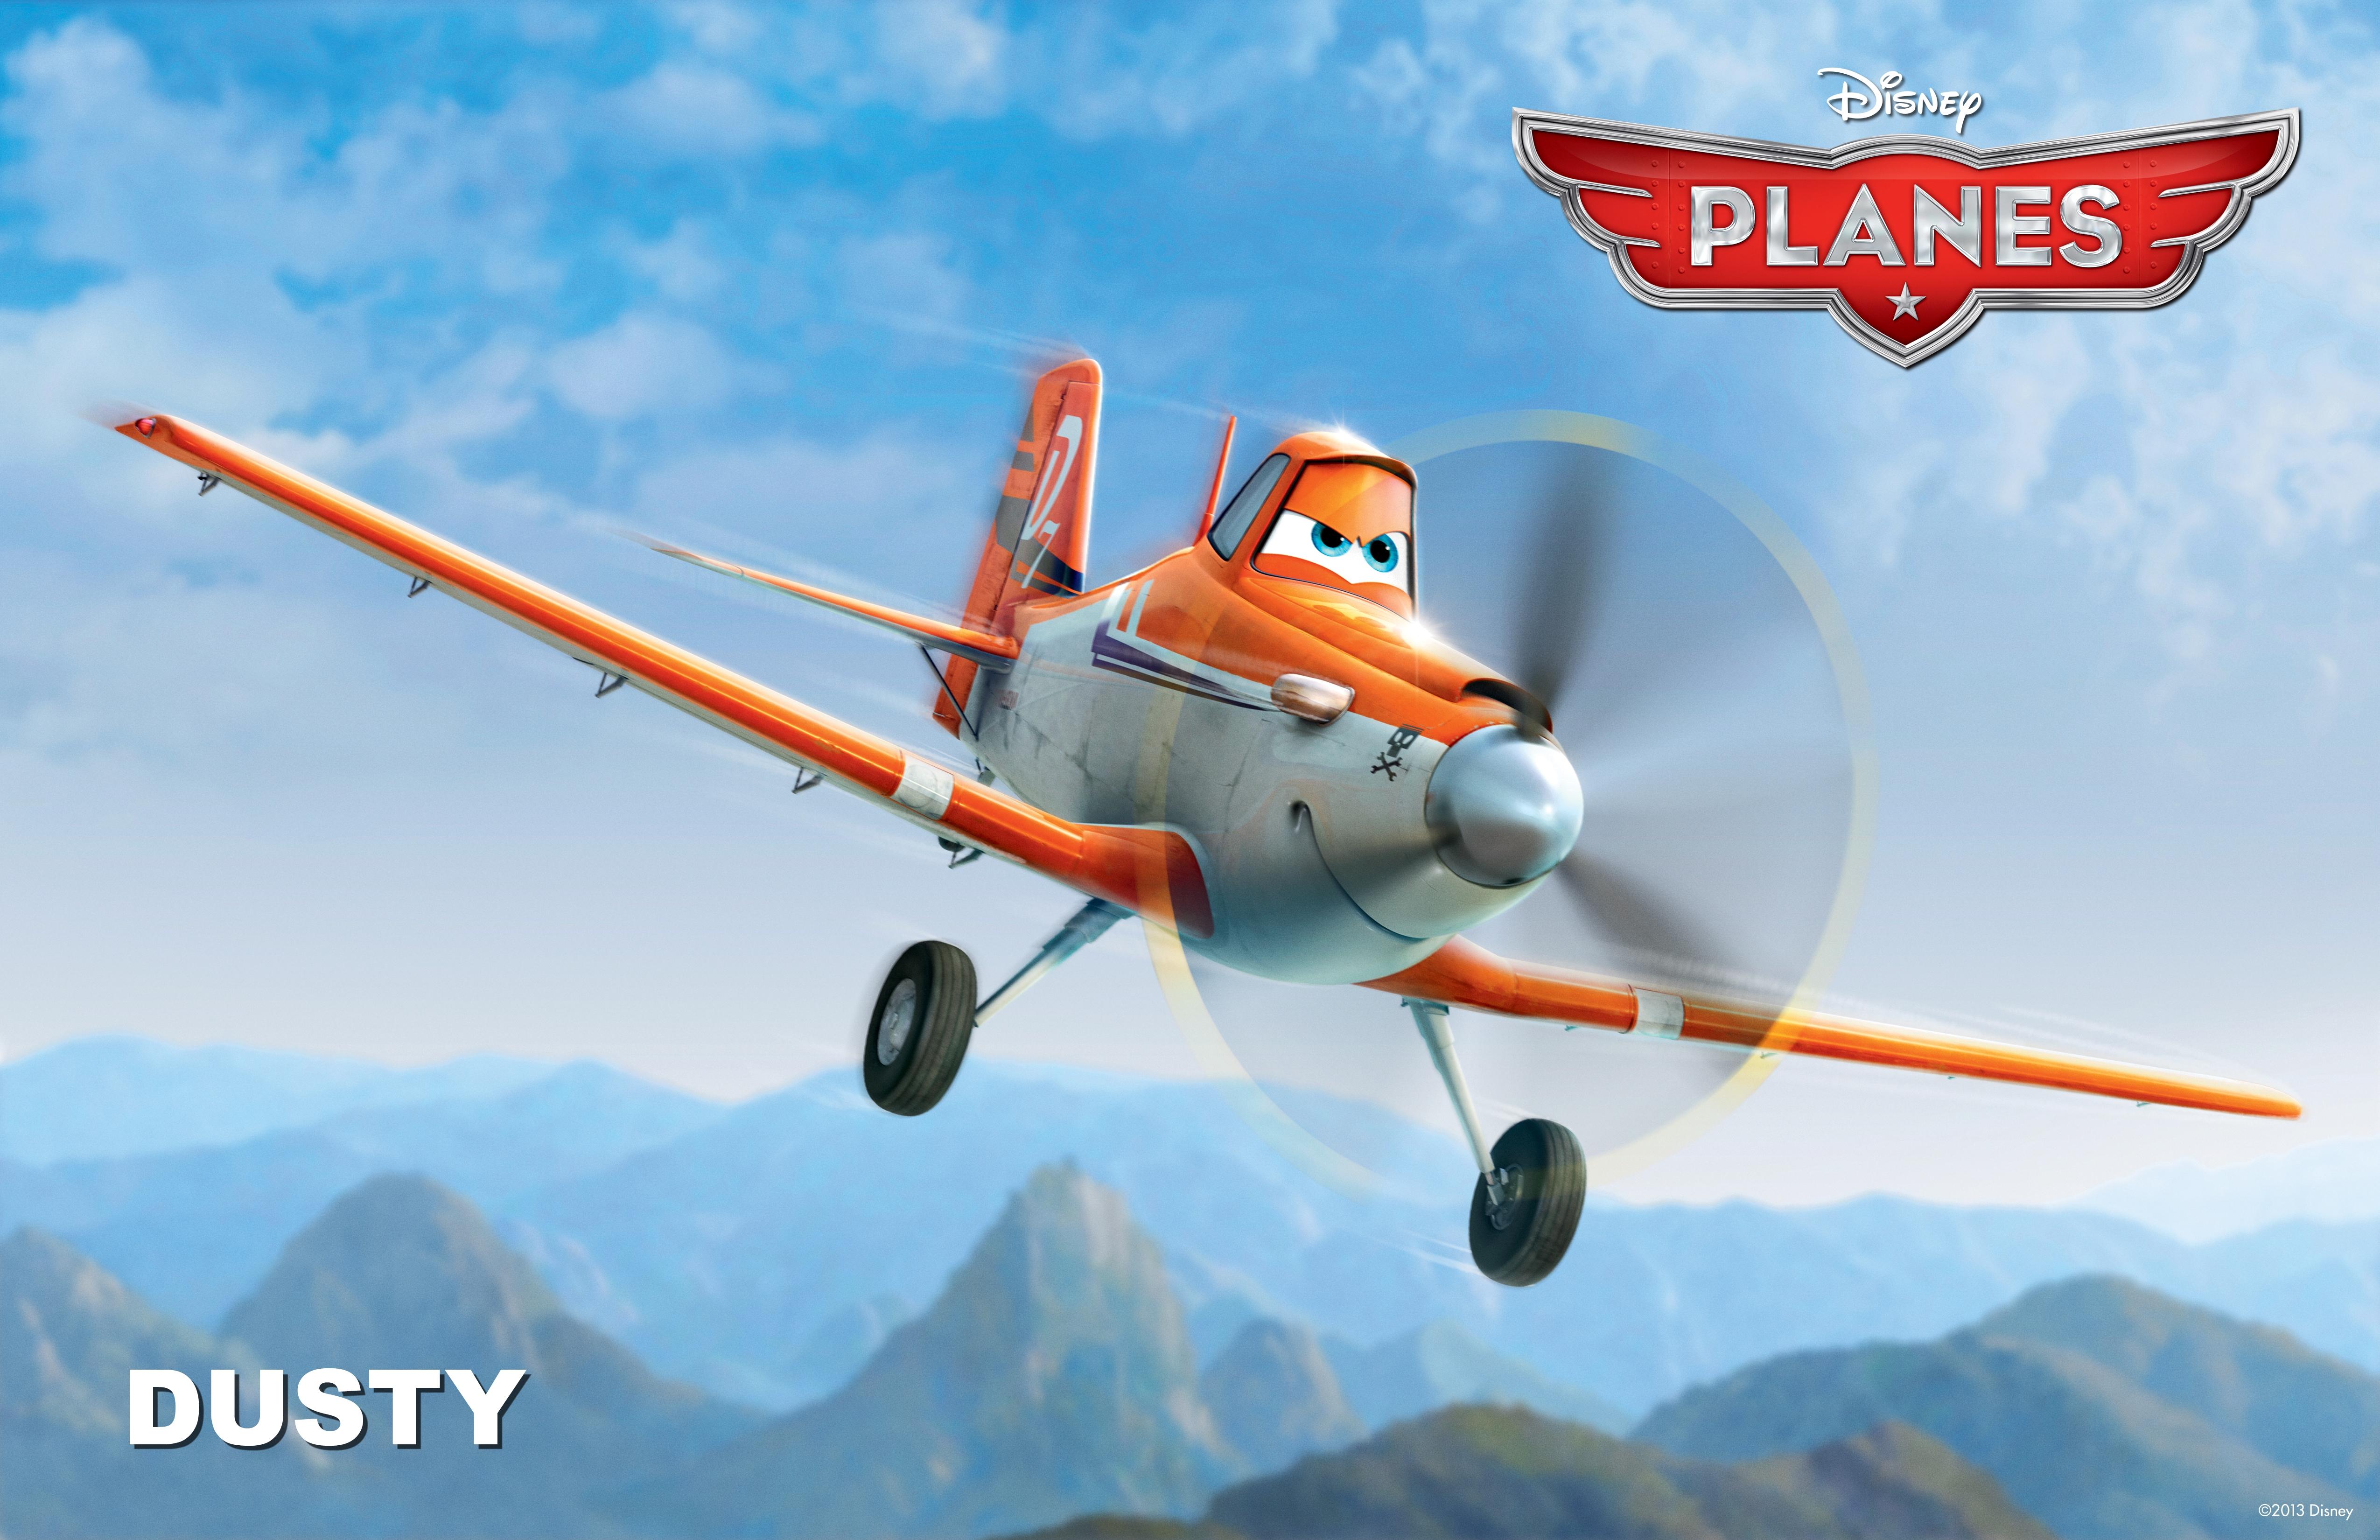 dusty rollouti disney pixar planes free hd wallpaper